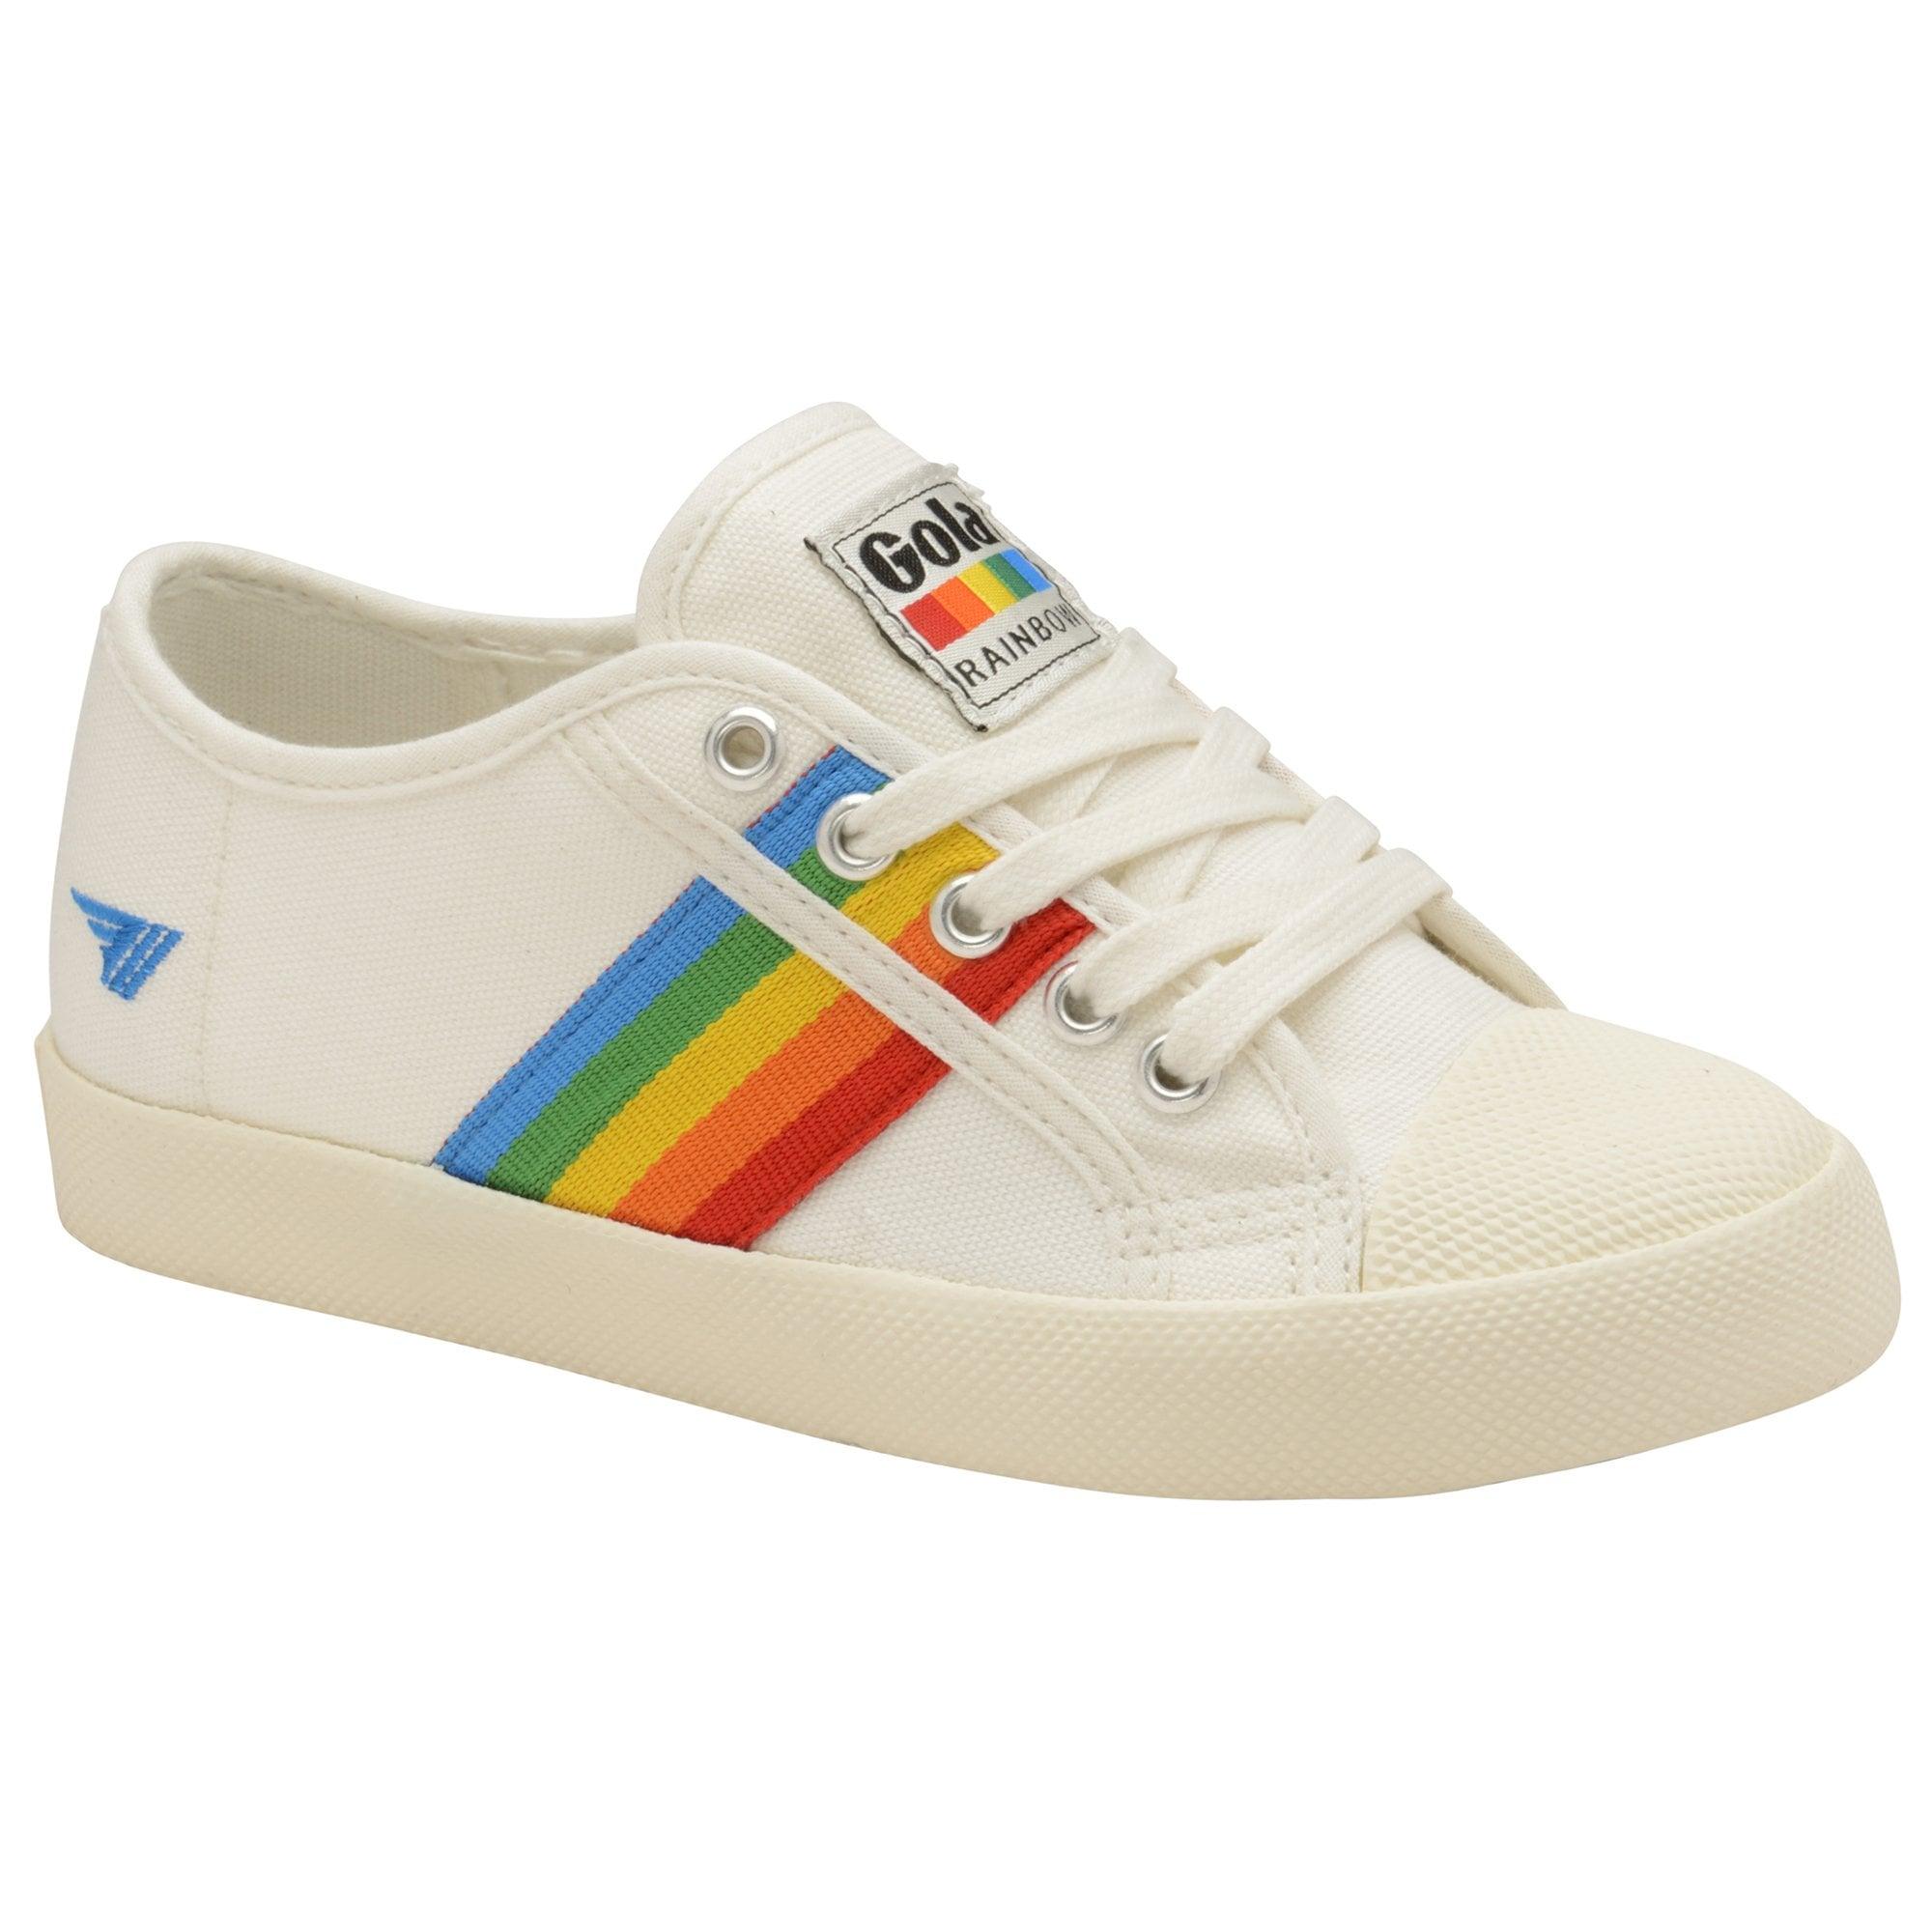 Buy Gola kids Coaster Rainbow trainers